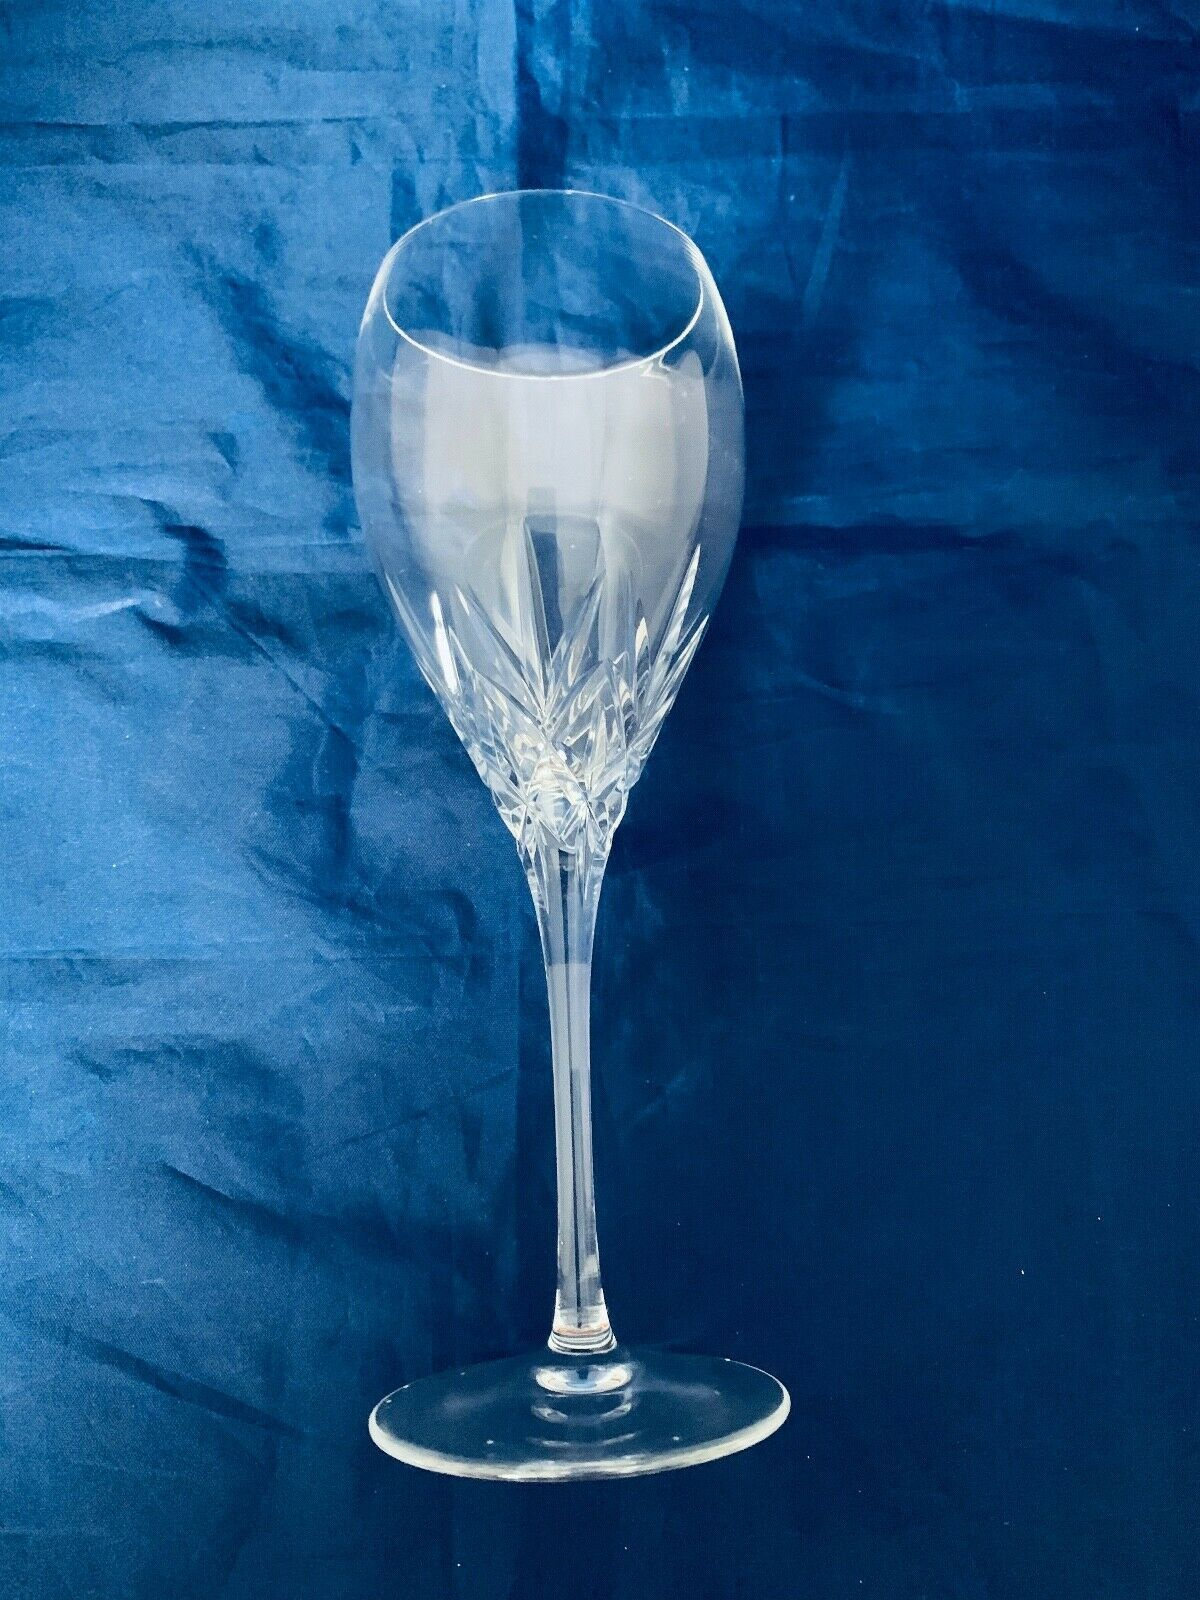 Longchamp Cristal D' Arques Wine Glasses 1 Glass - $14.95